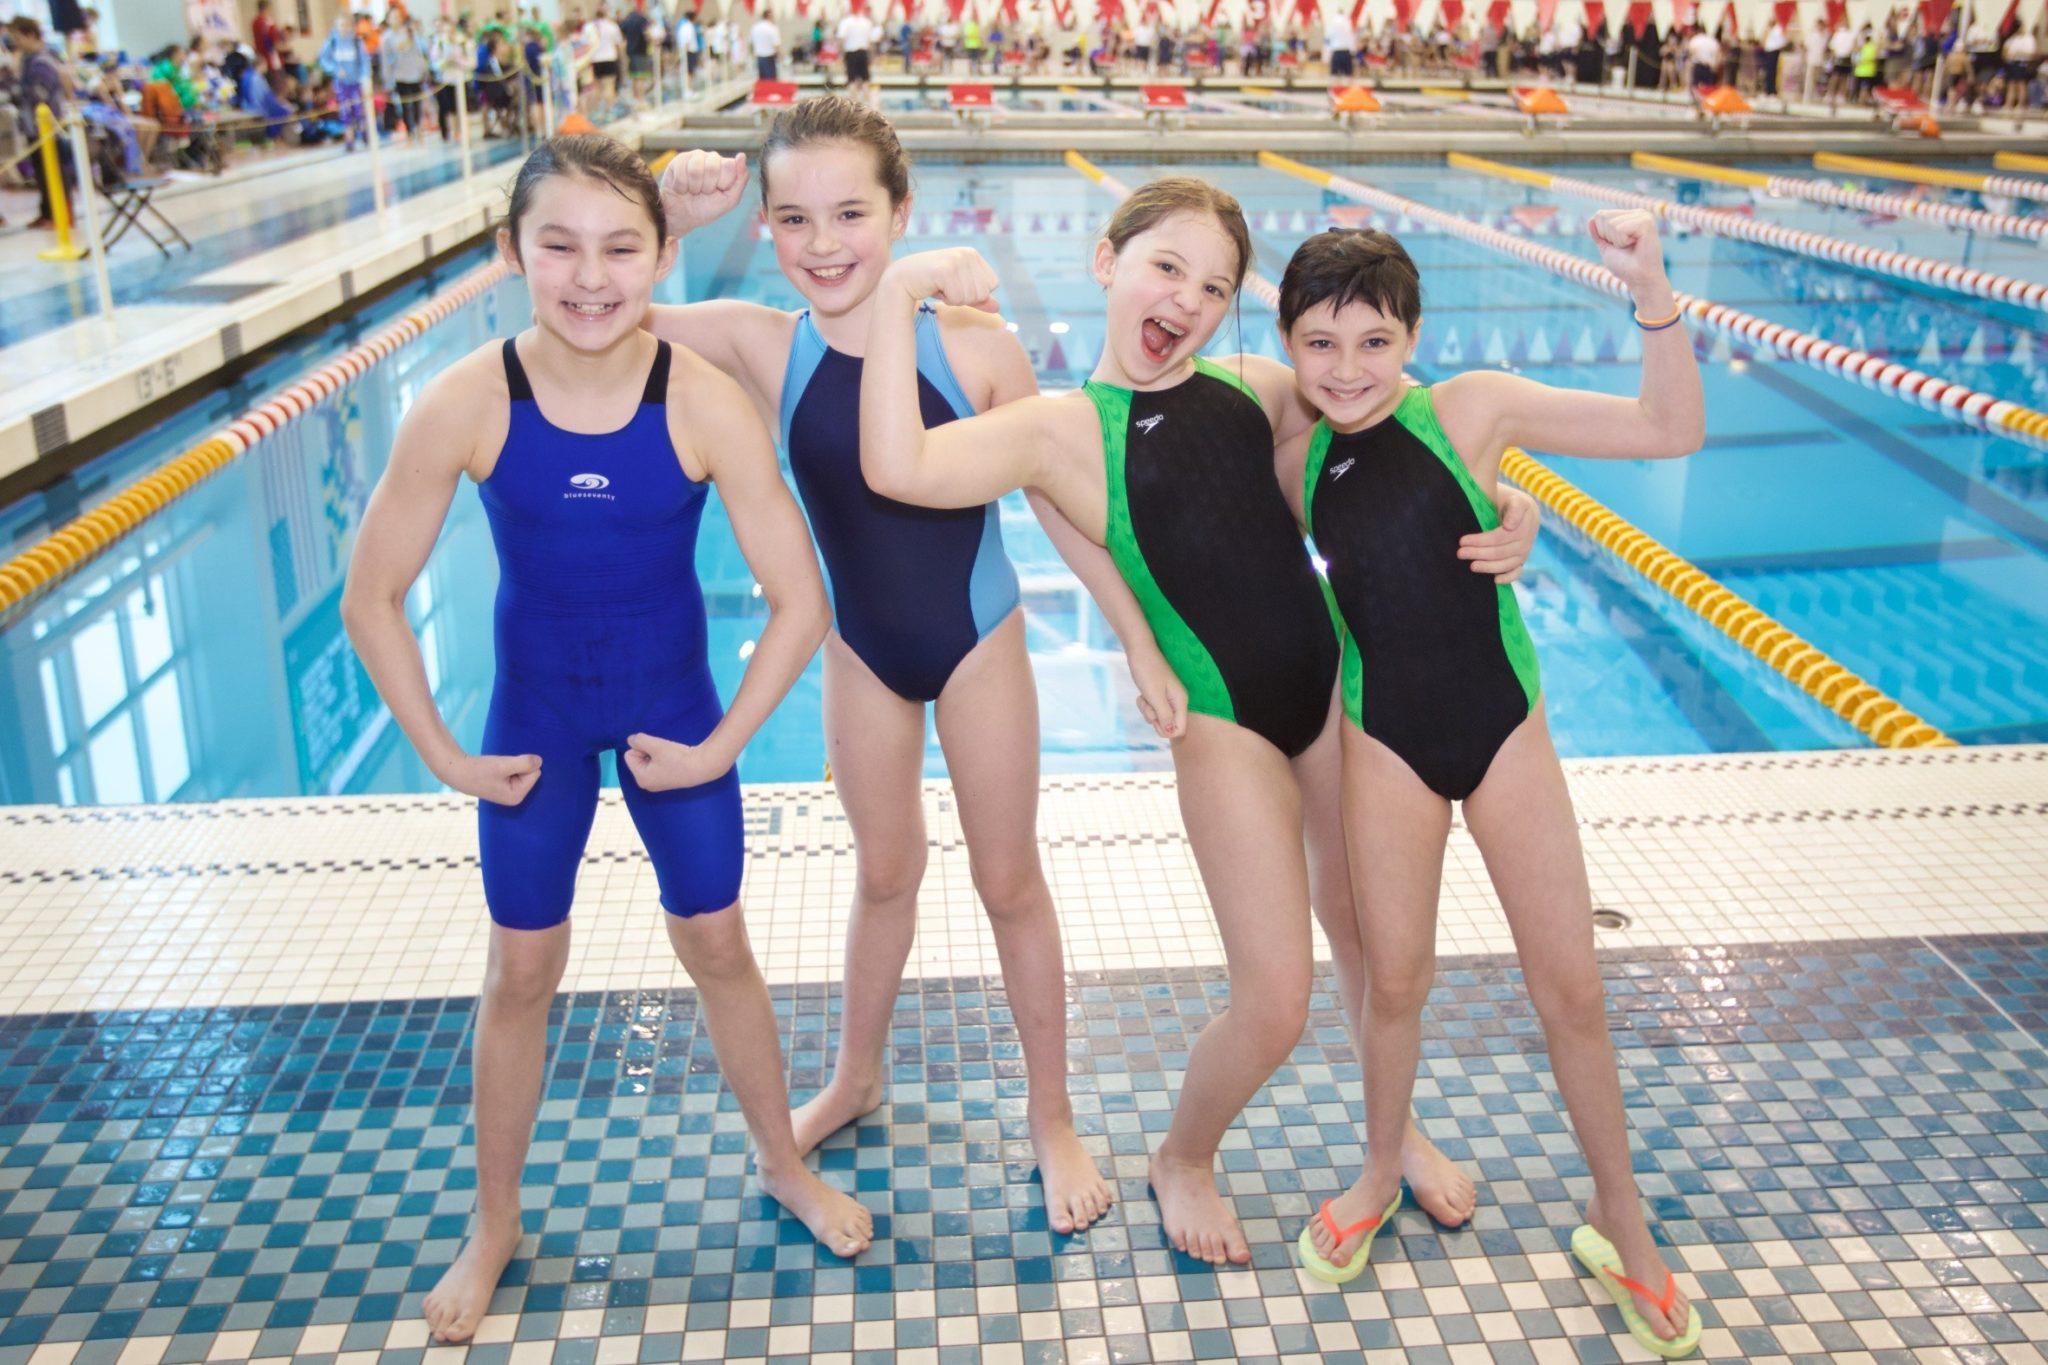 2015 junior olympics at univ of maryland photo vault olympic swimming pool 2015